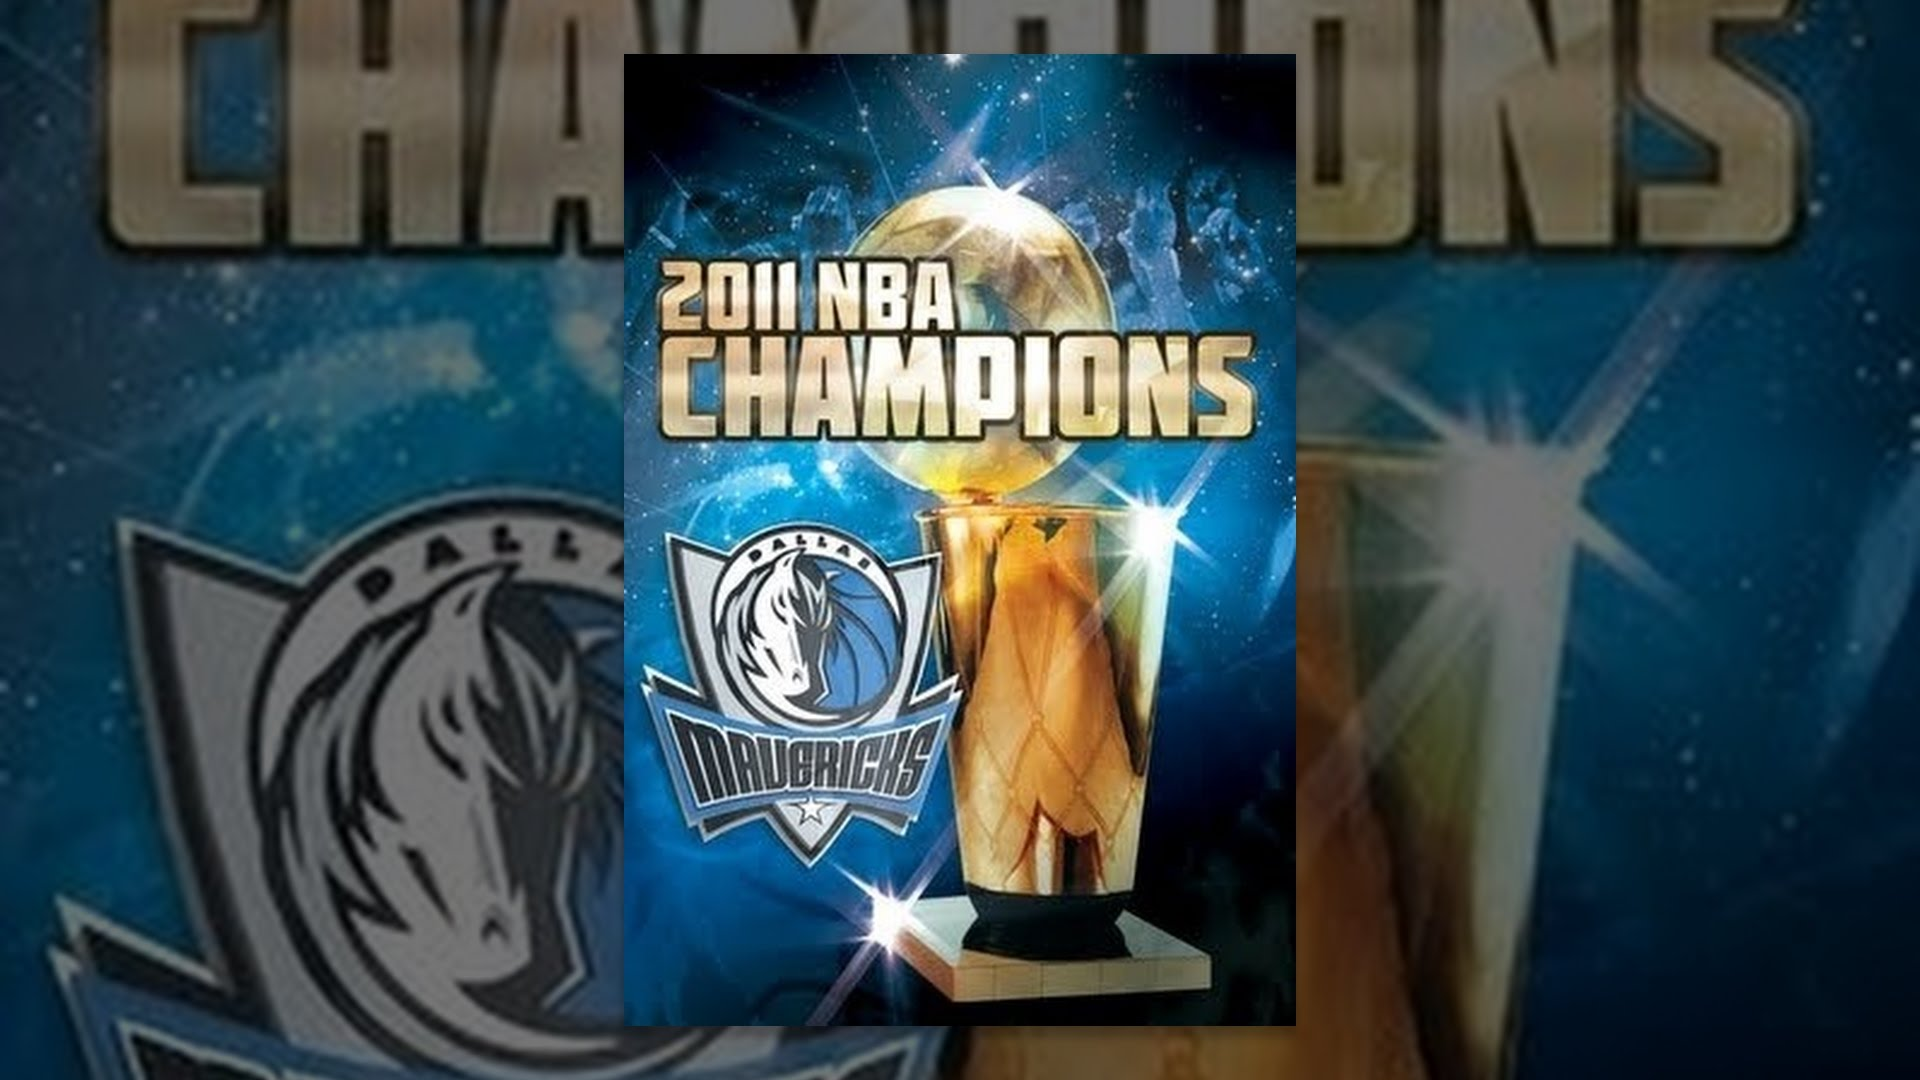 NBA Finals: Warriors take aim at an unprecedented 16-0